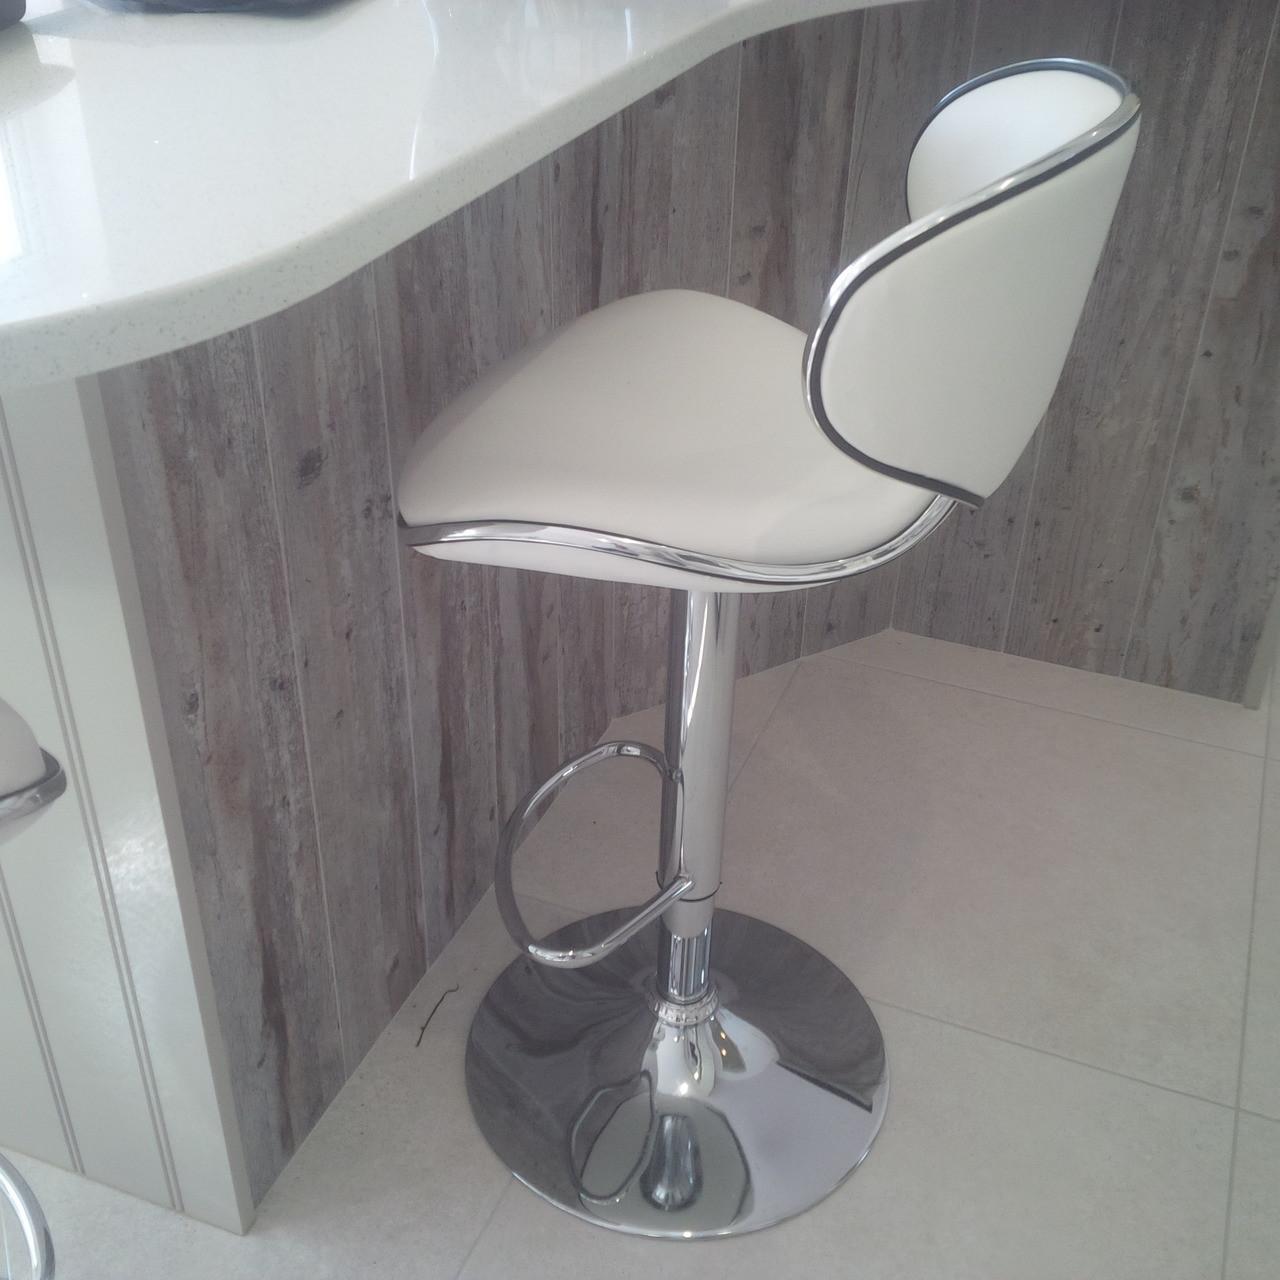 Carcaso kitchen stool white breakfast bar stools for White breakfast bar stools